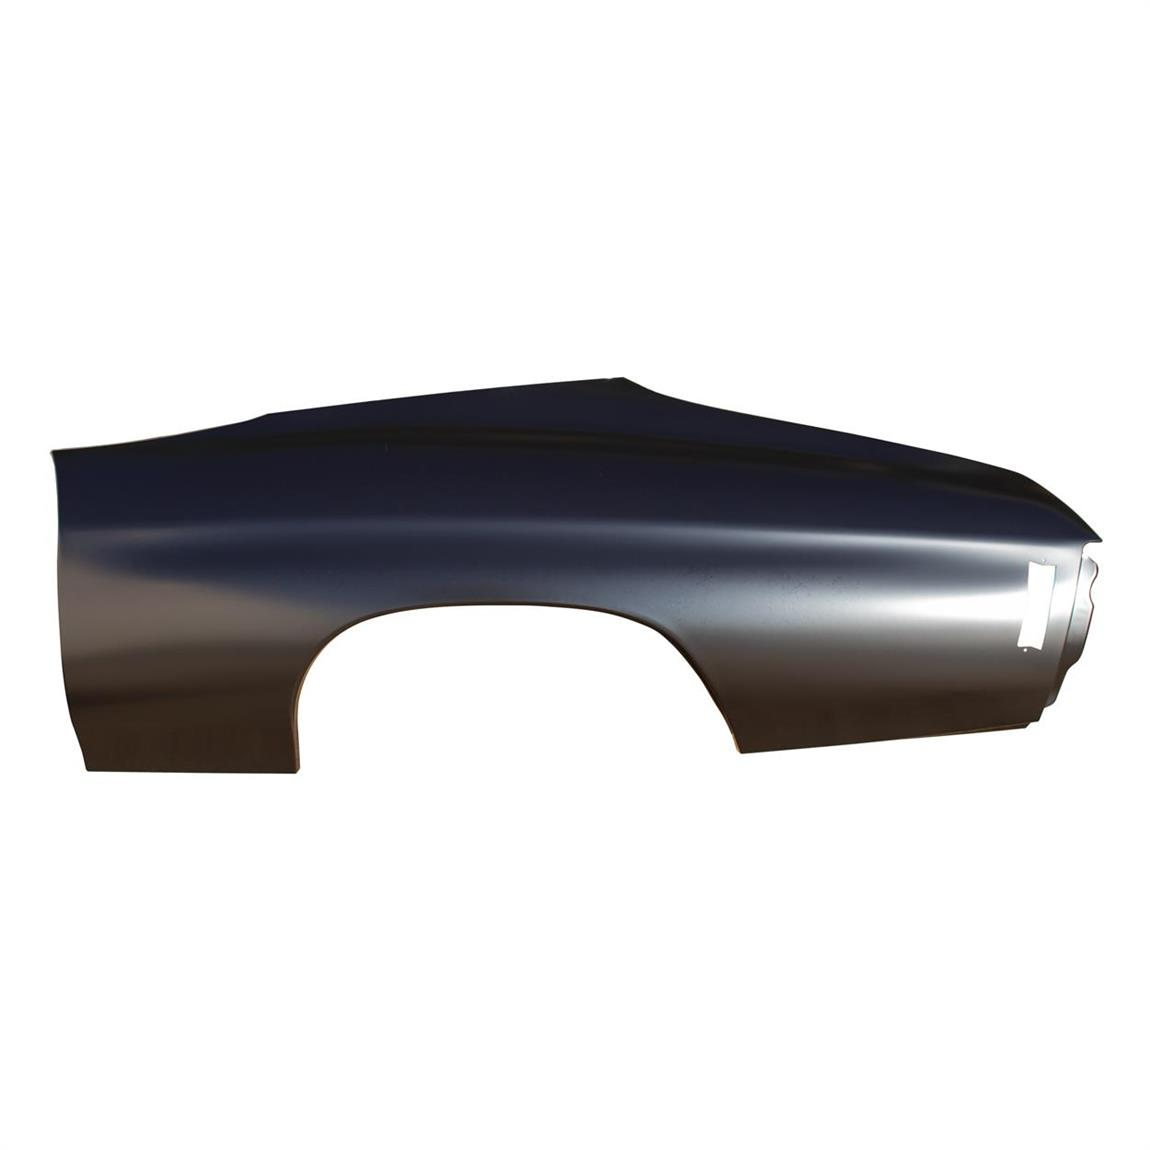 Auto Metal Direct 700-3470-R Full OE-Style Quarter Panel